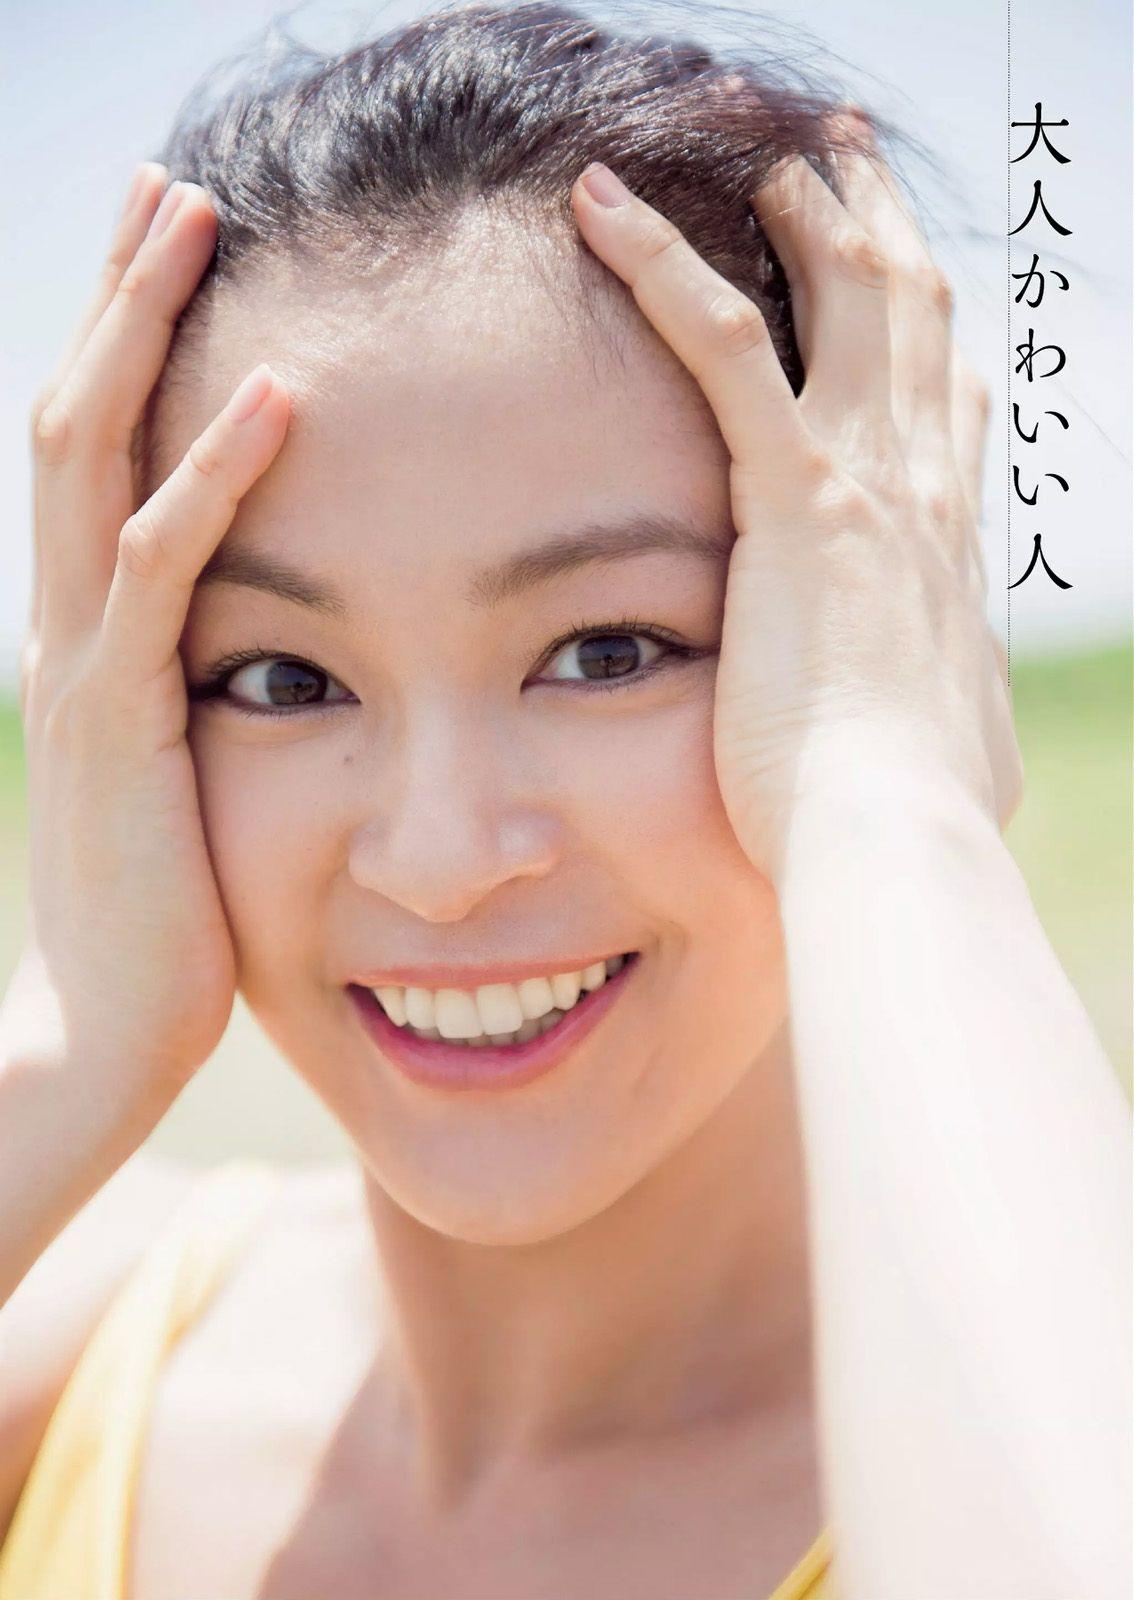 Tomoka Kurotani nude (44 foto) Boobs, iCloud, lingerie